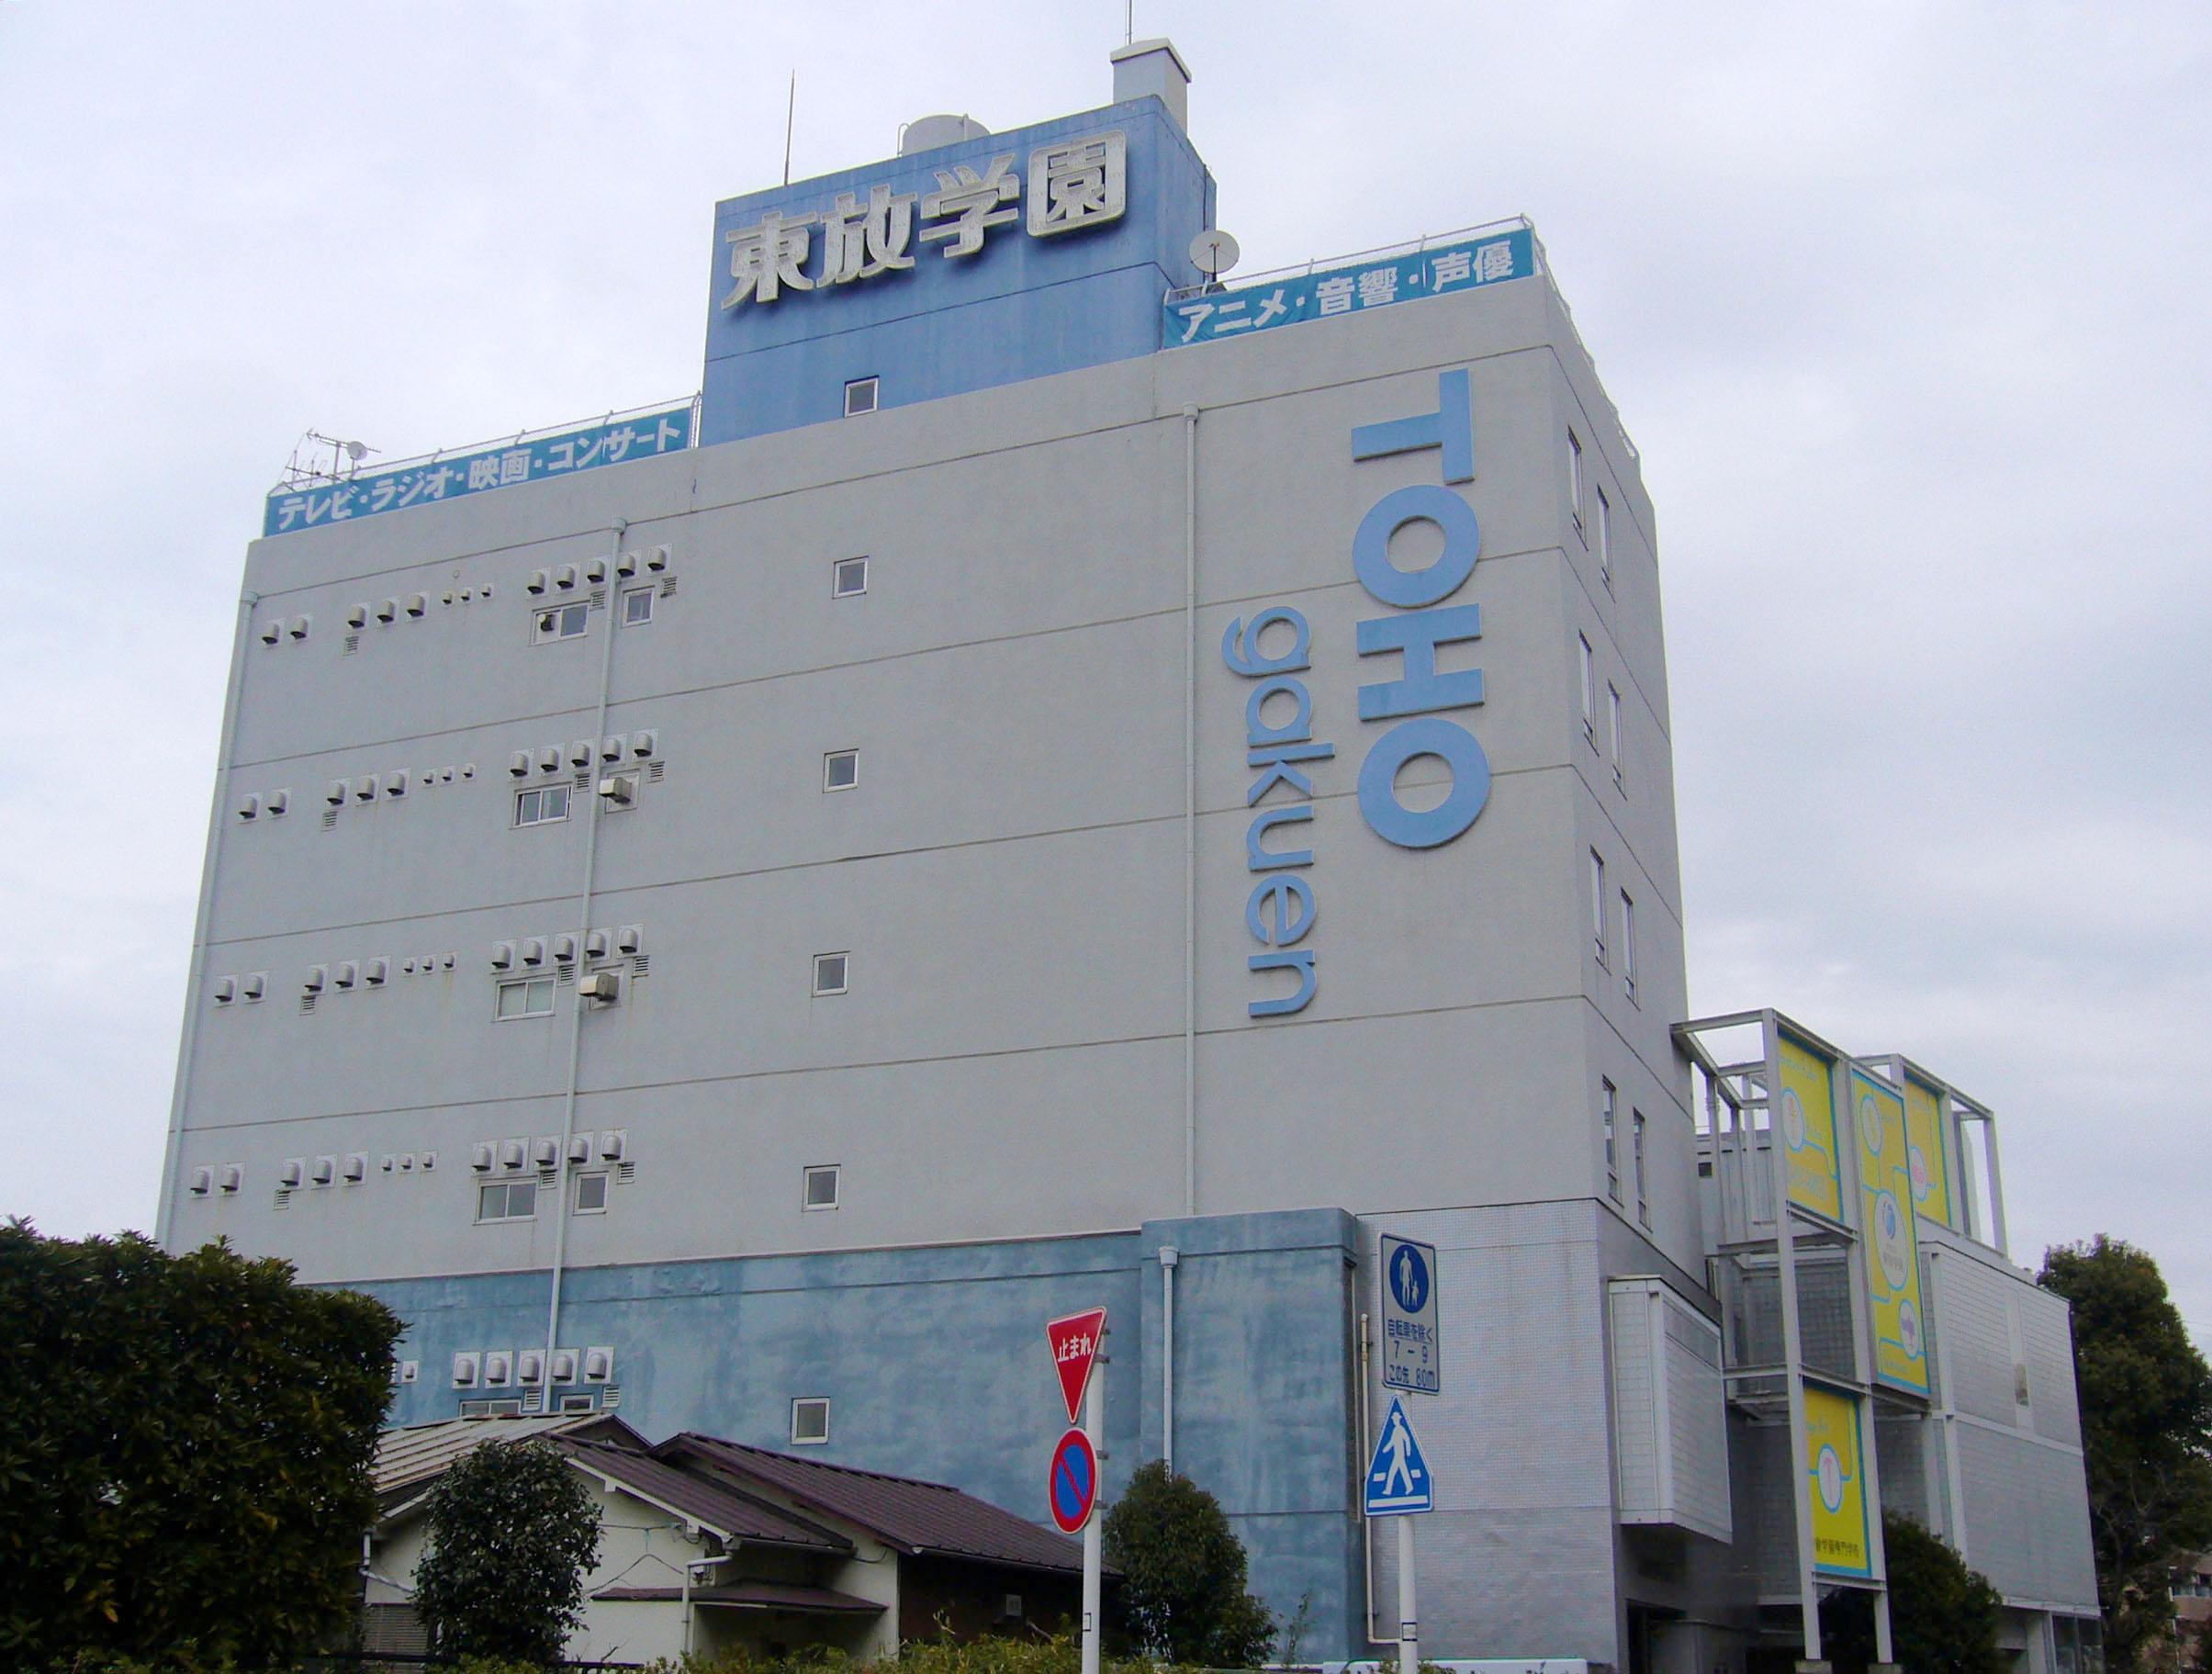 Toho_Gakuen_Media_Training_College_W_2012-02-26